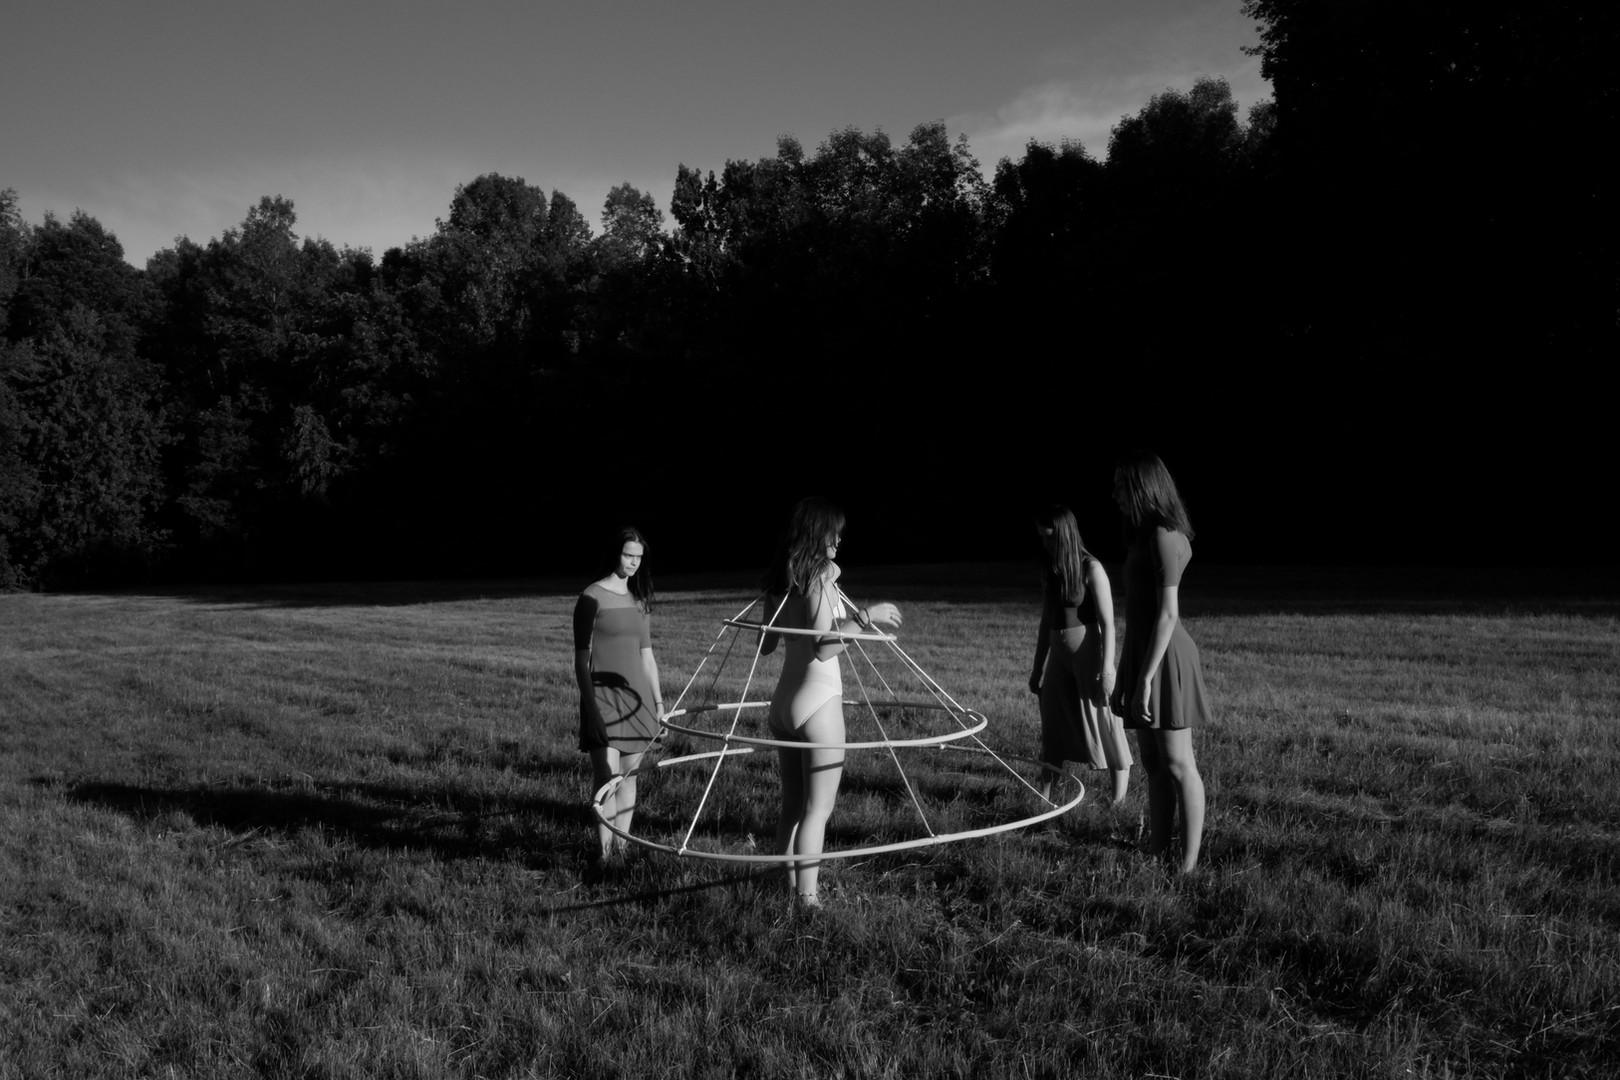 Photos © Maelle Asselin-Duguay